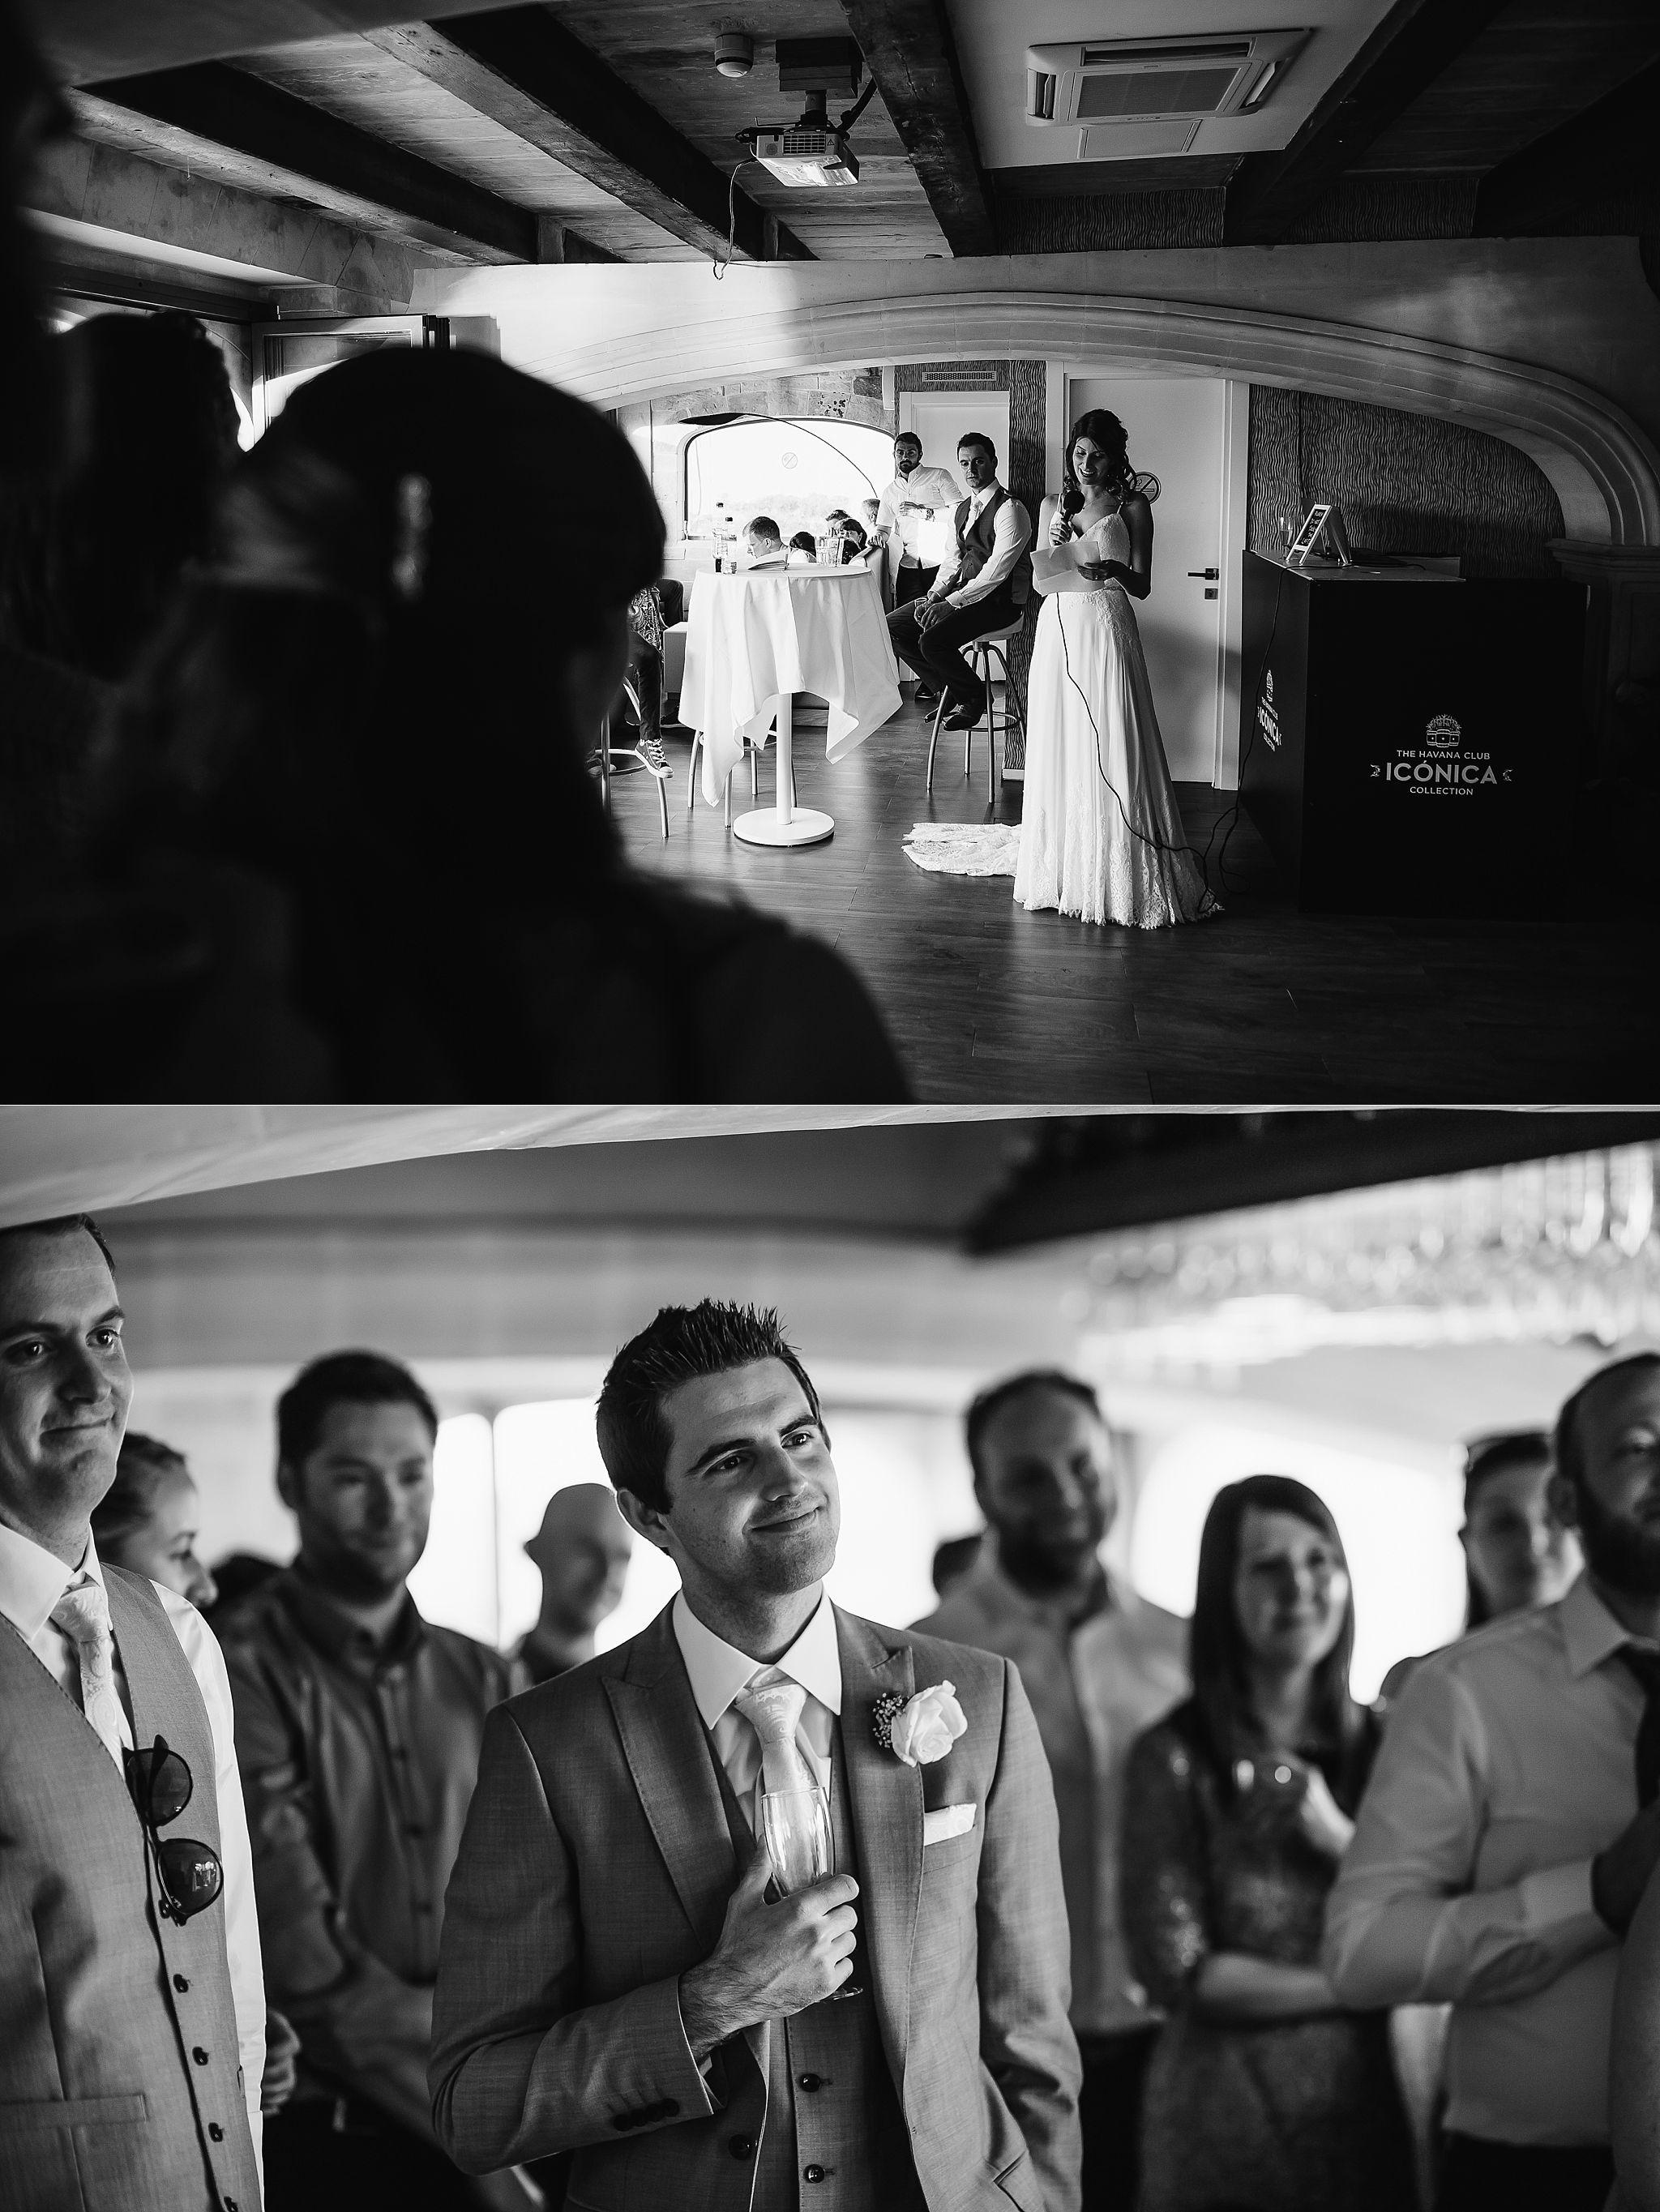 Annalisa & David | Weddings in Malta - Shane P. Watts Photography